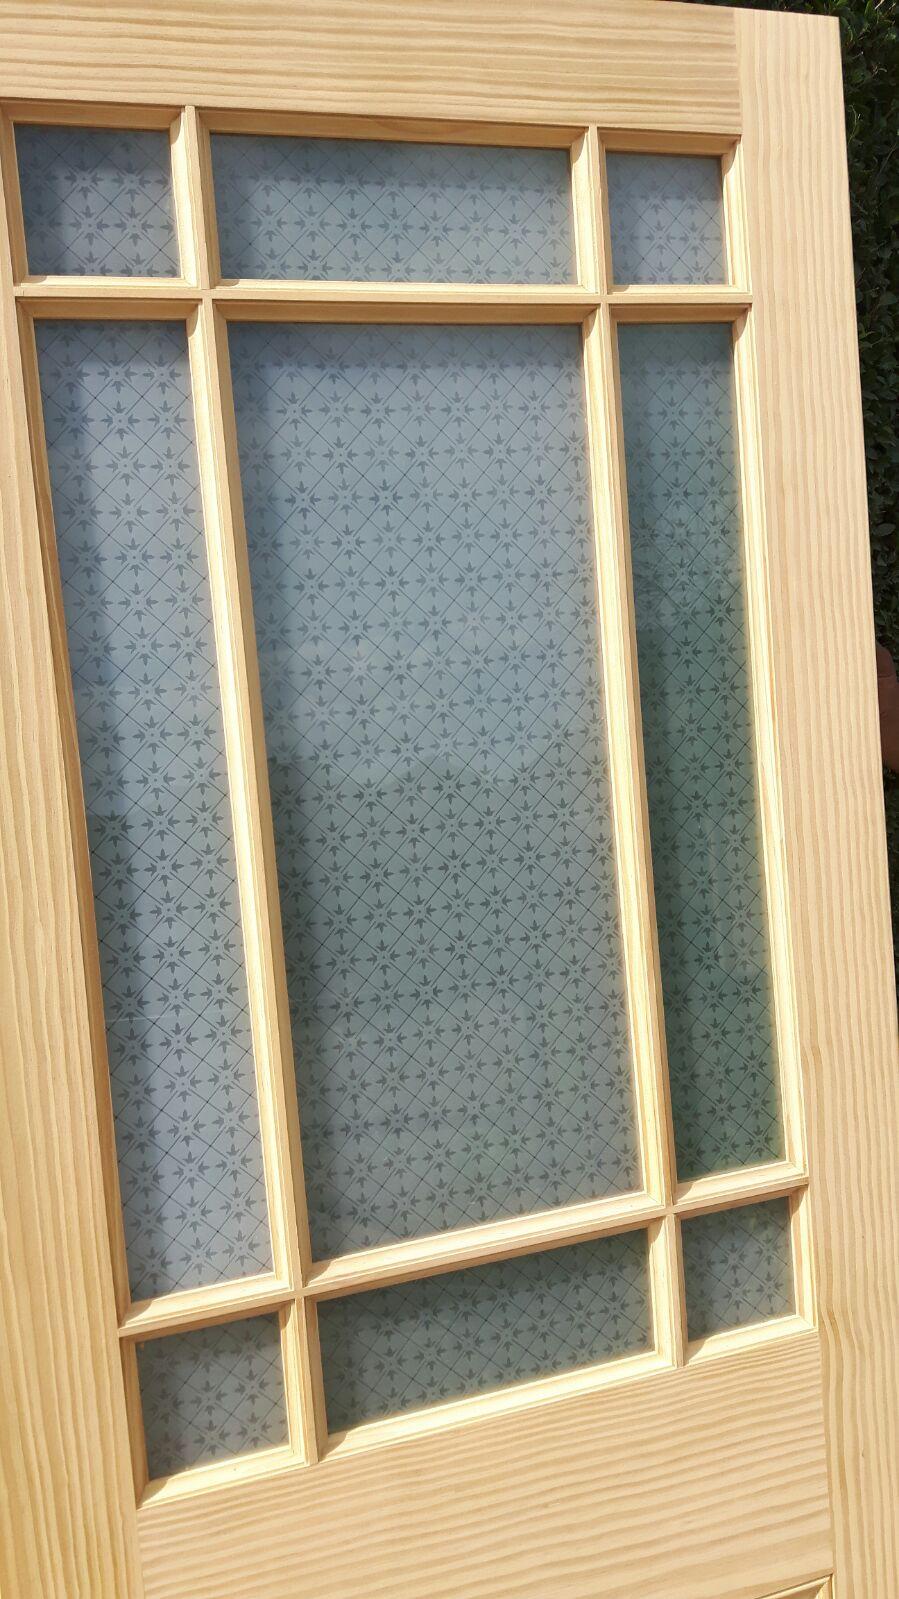 New solid 9 panel glazed glass pine interior door solid for 10 panel glass interior door